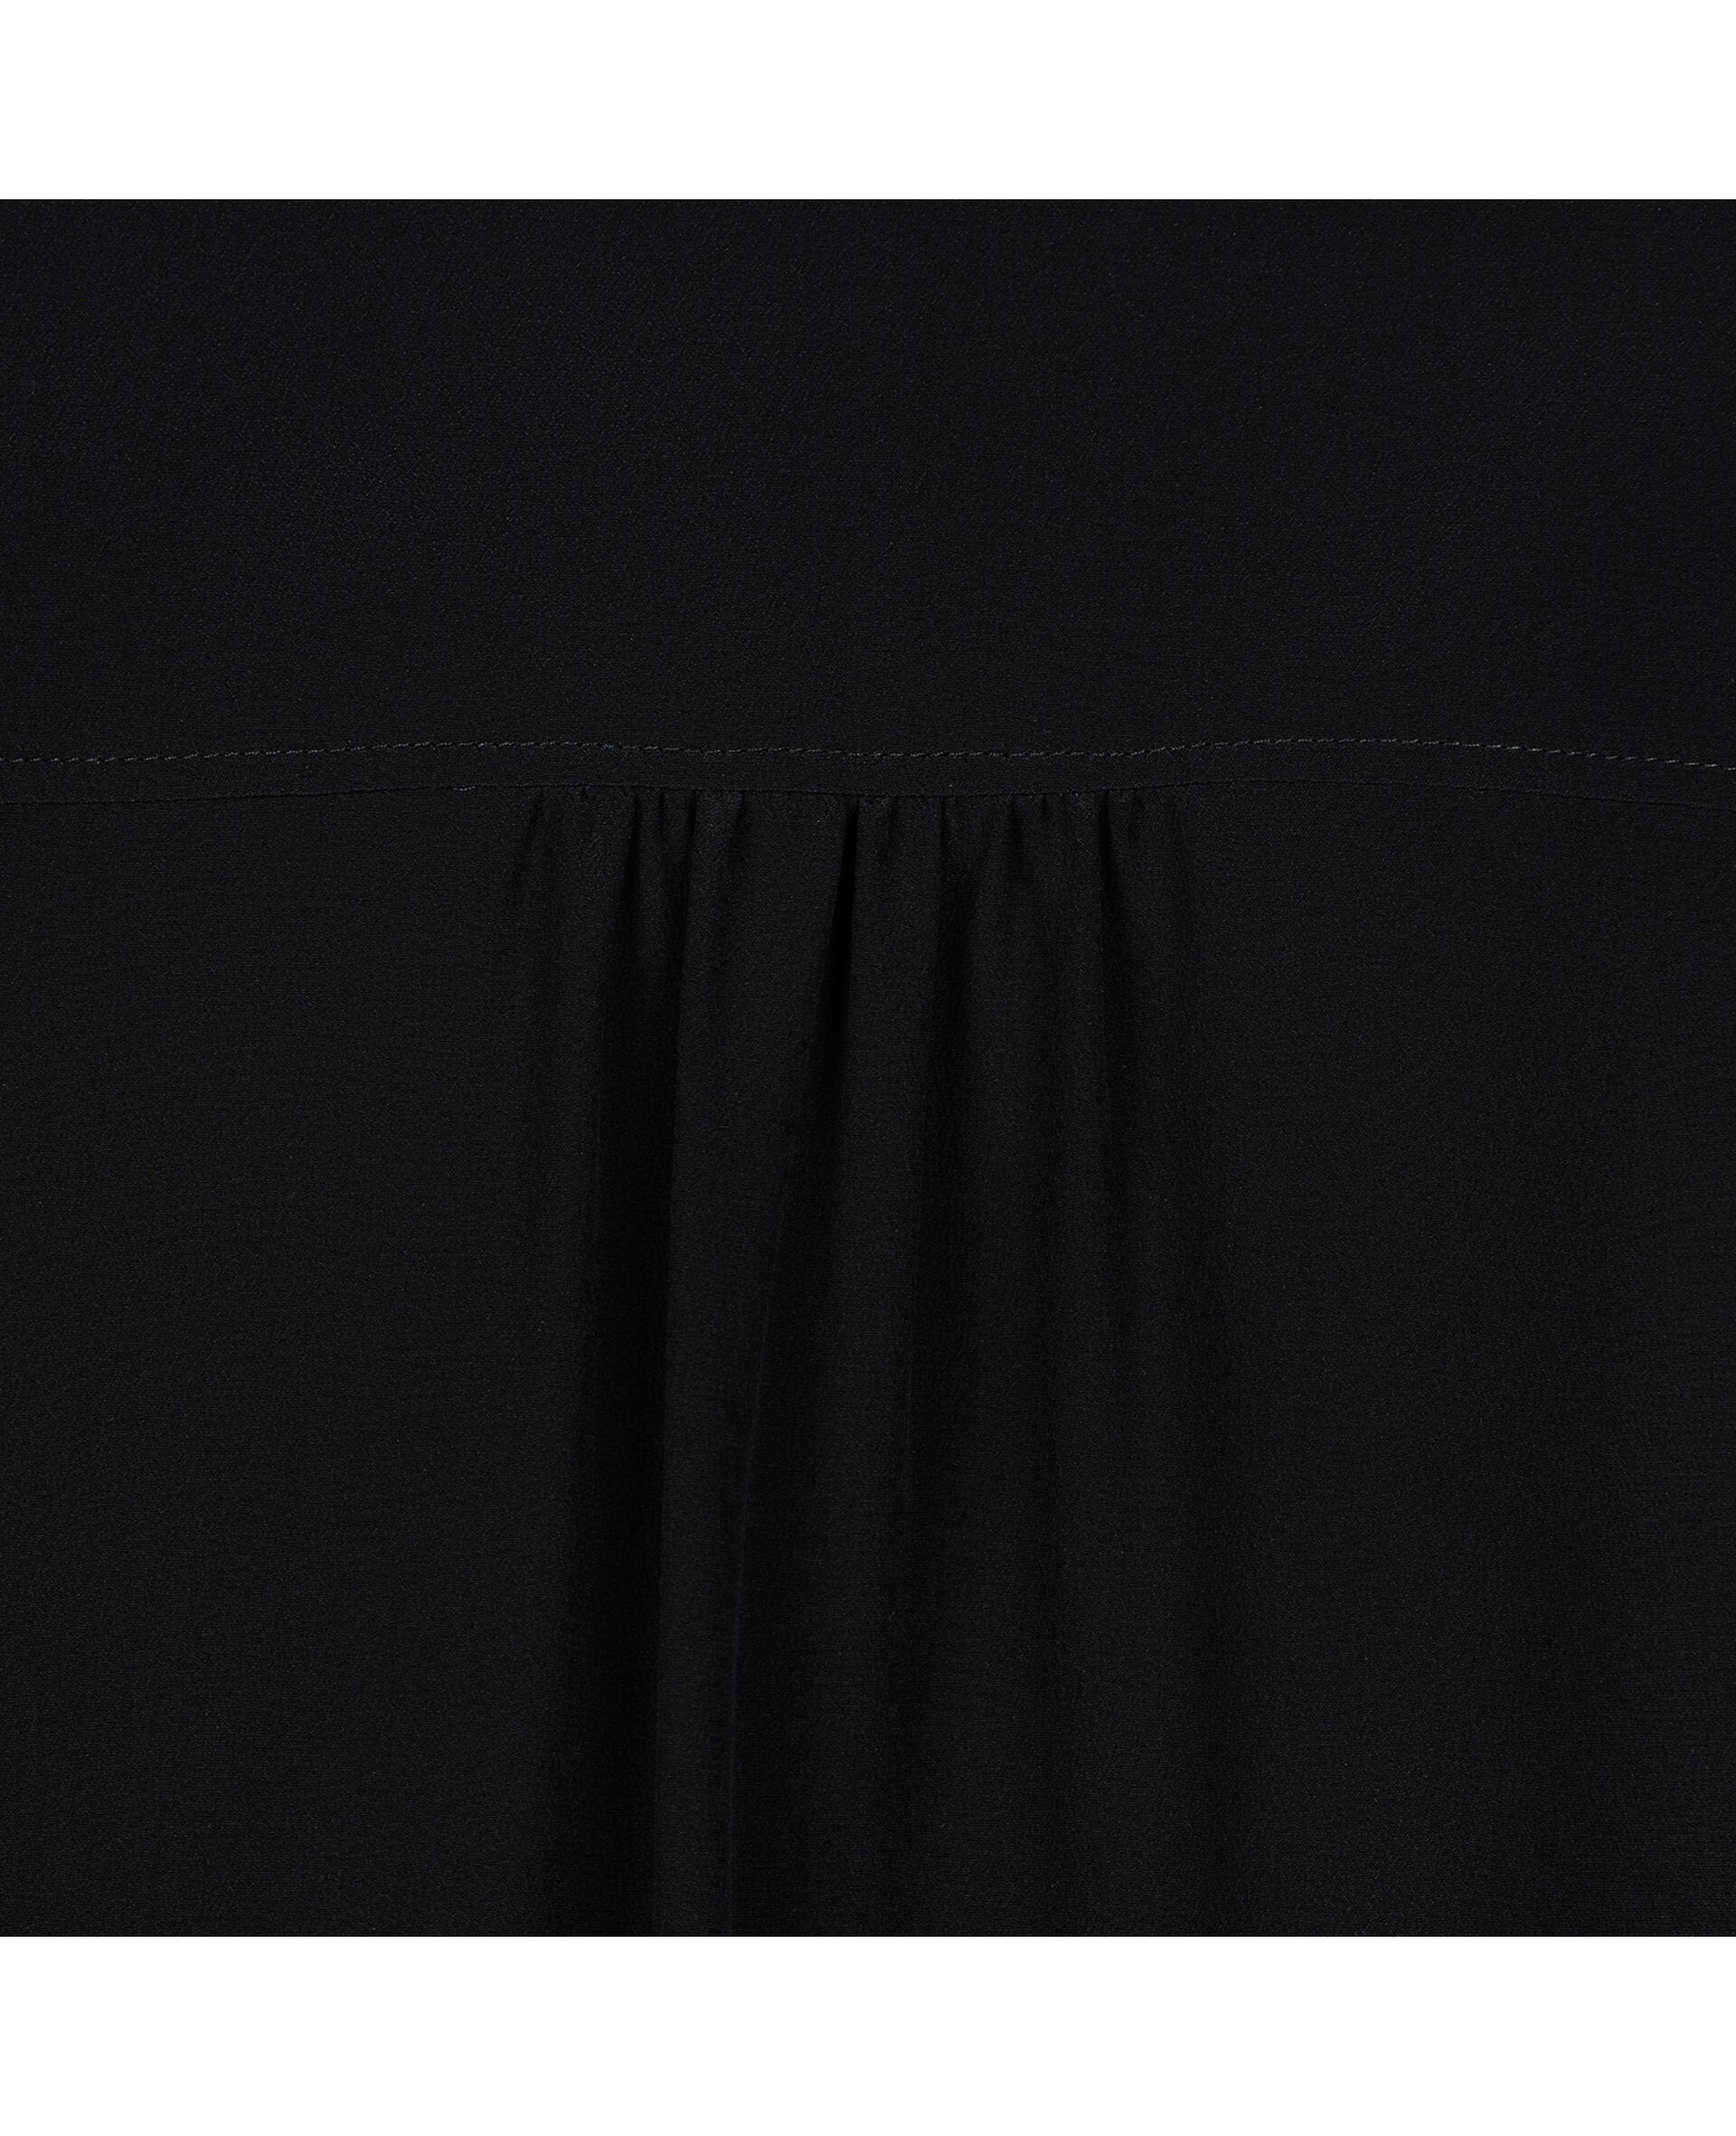 Chemise Estelle-Noir-large image number 2